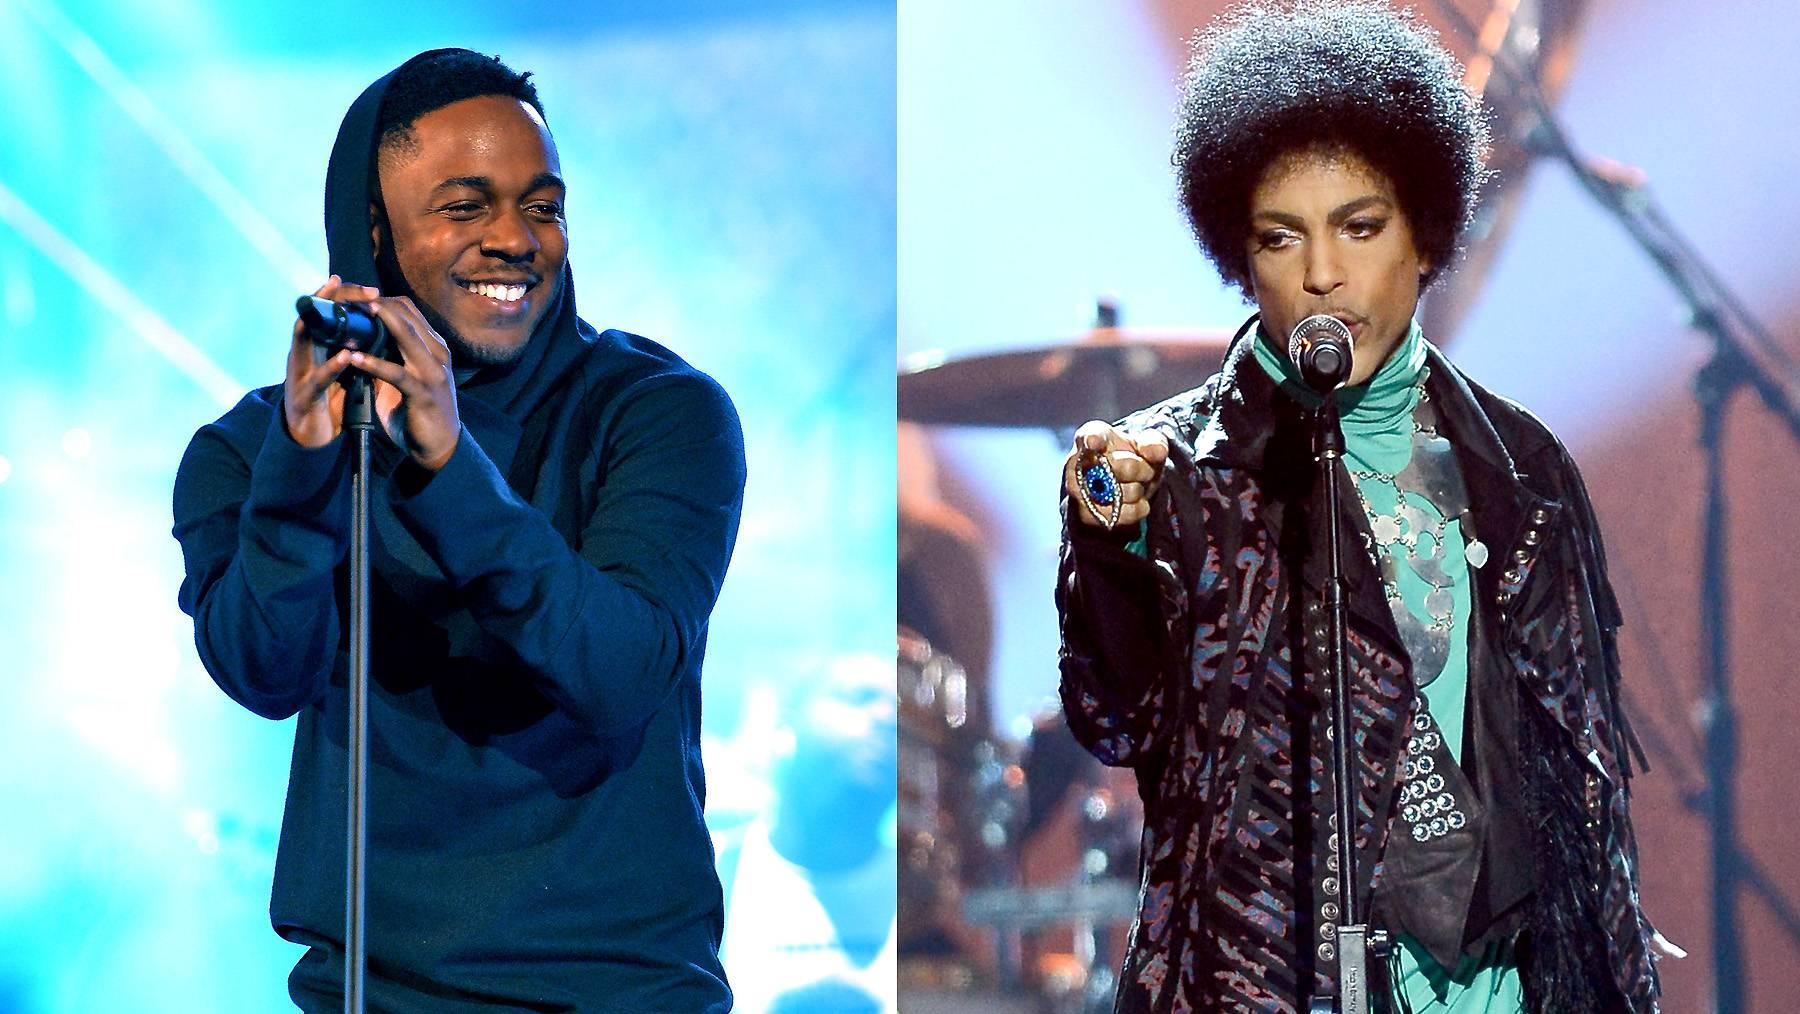 /content/dam/betcom/images/2014/10/Music-10-01-10-15/100114-music-kendrick-lamar-prince-performs.jpg